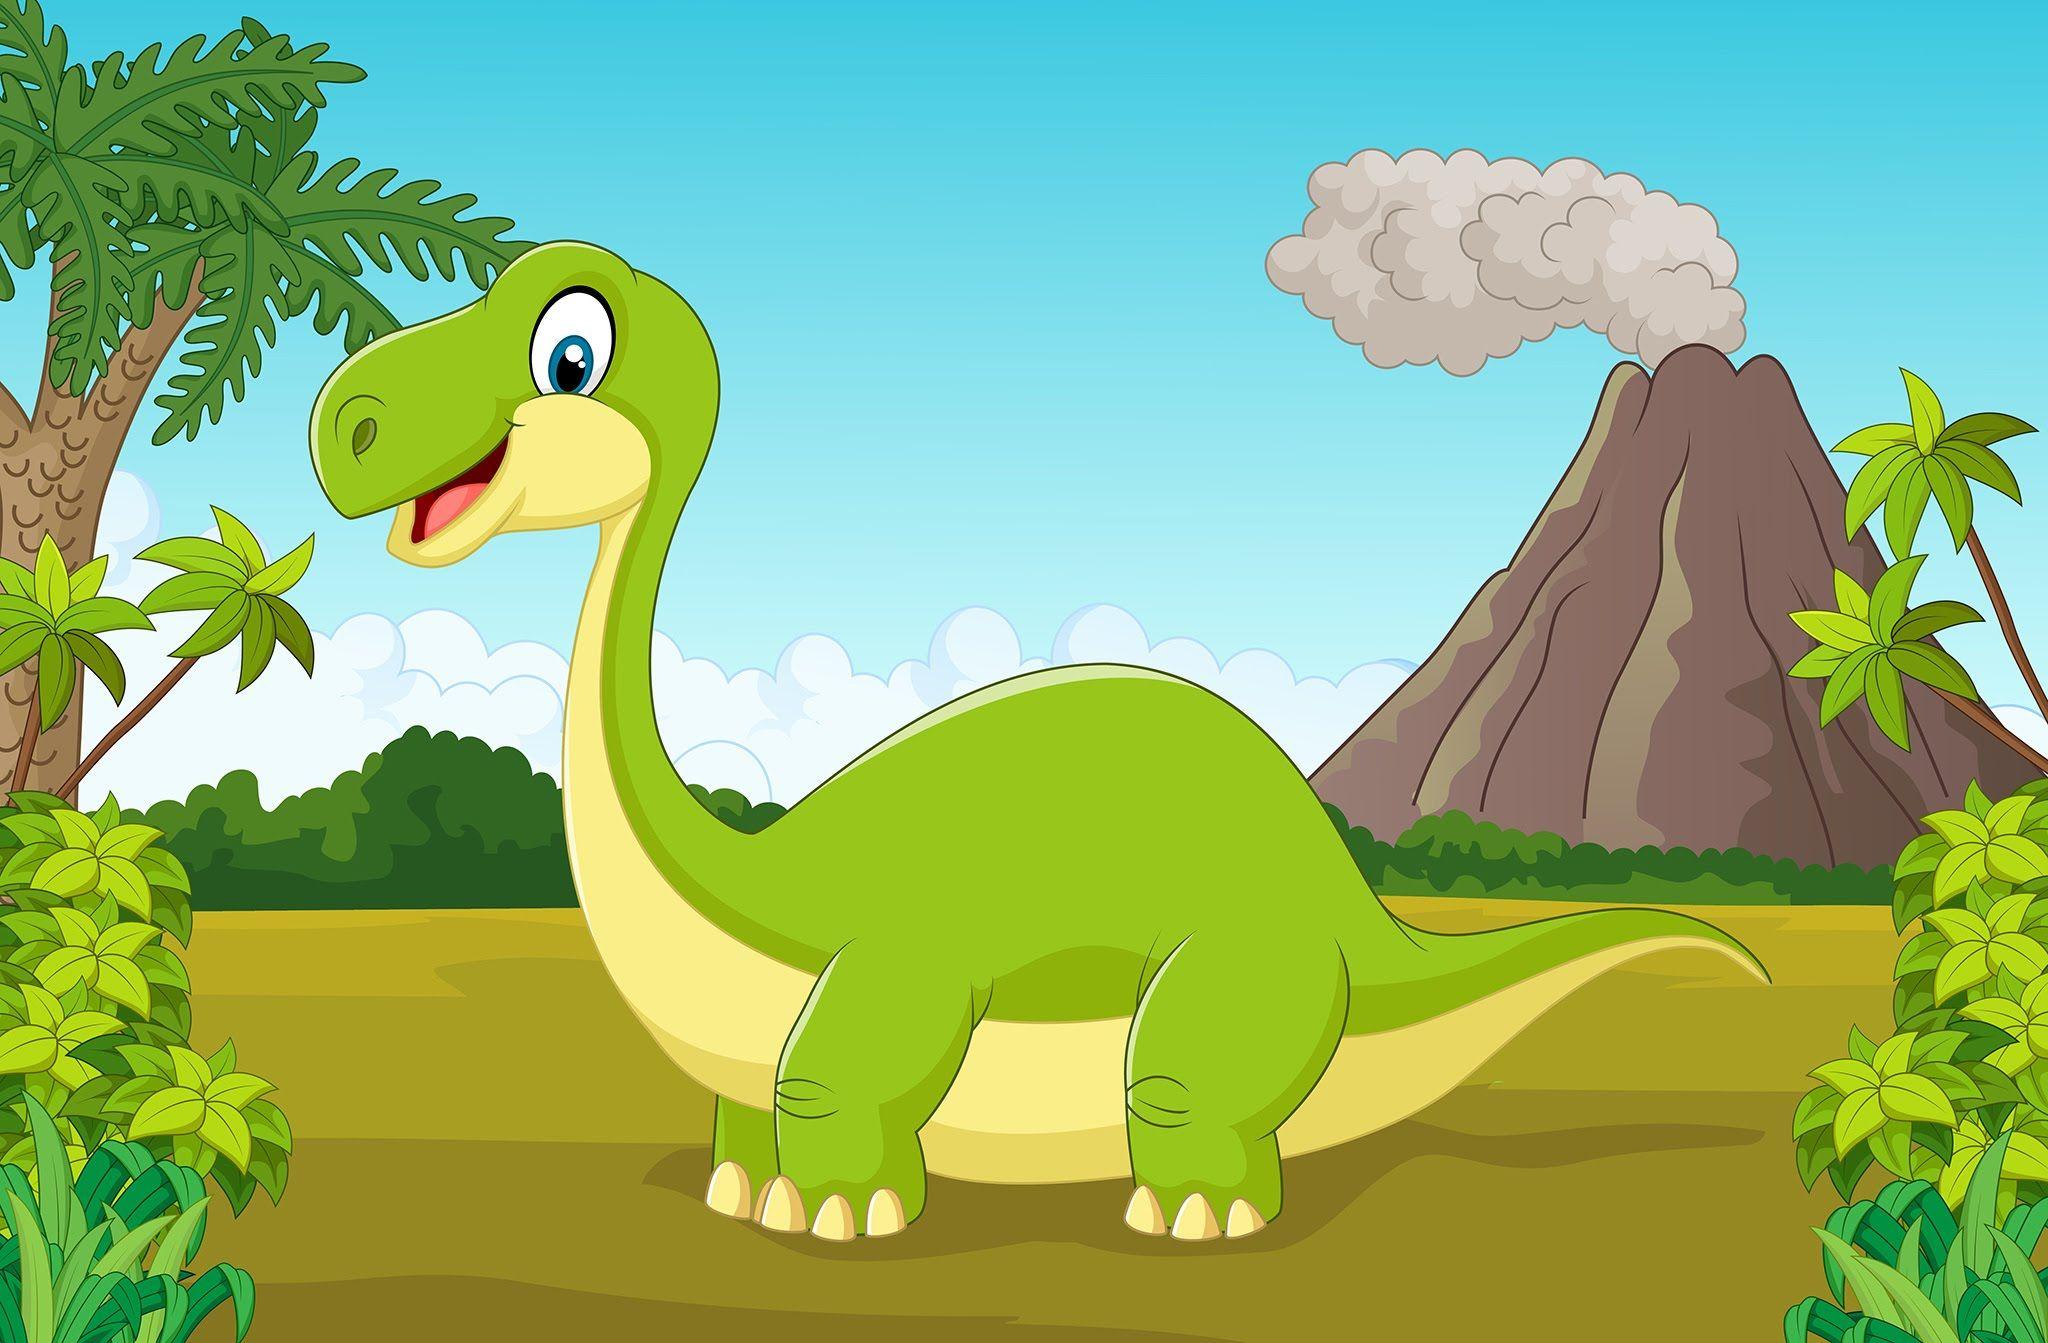 dinosaur cartoon - dinosaurs cartoon short movie - cute dinosaur cartoon | Cartoon  dinosaur, Dinosaur images, Cute dinosaur